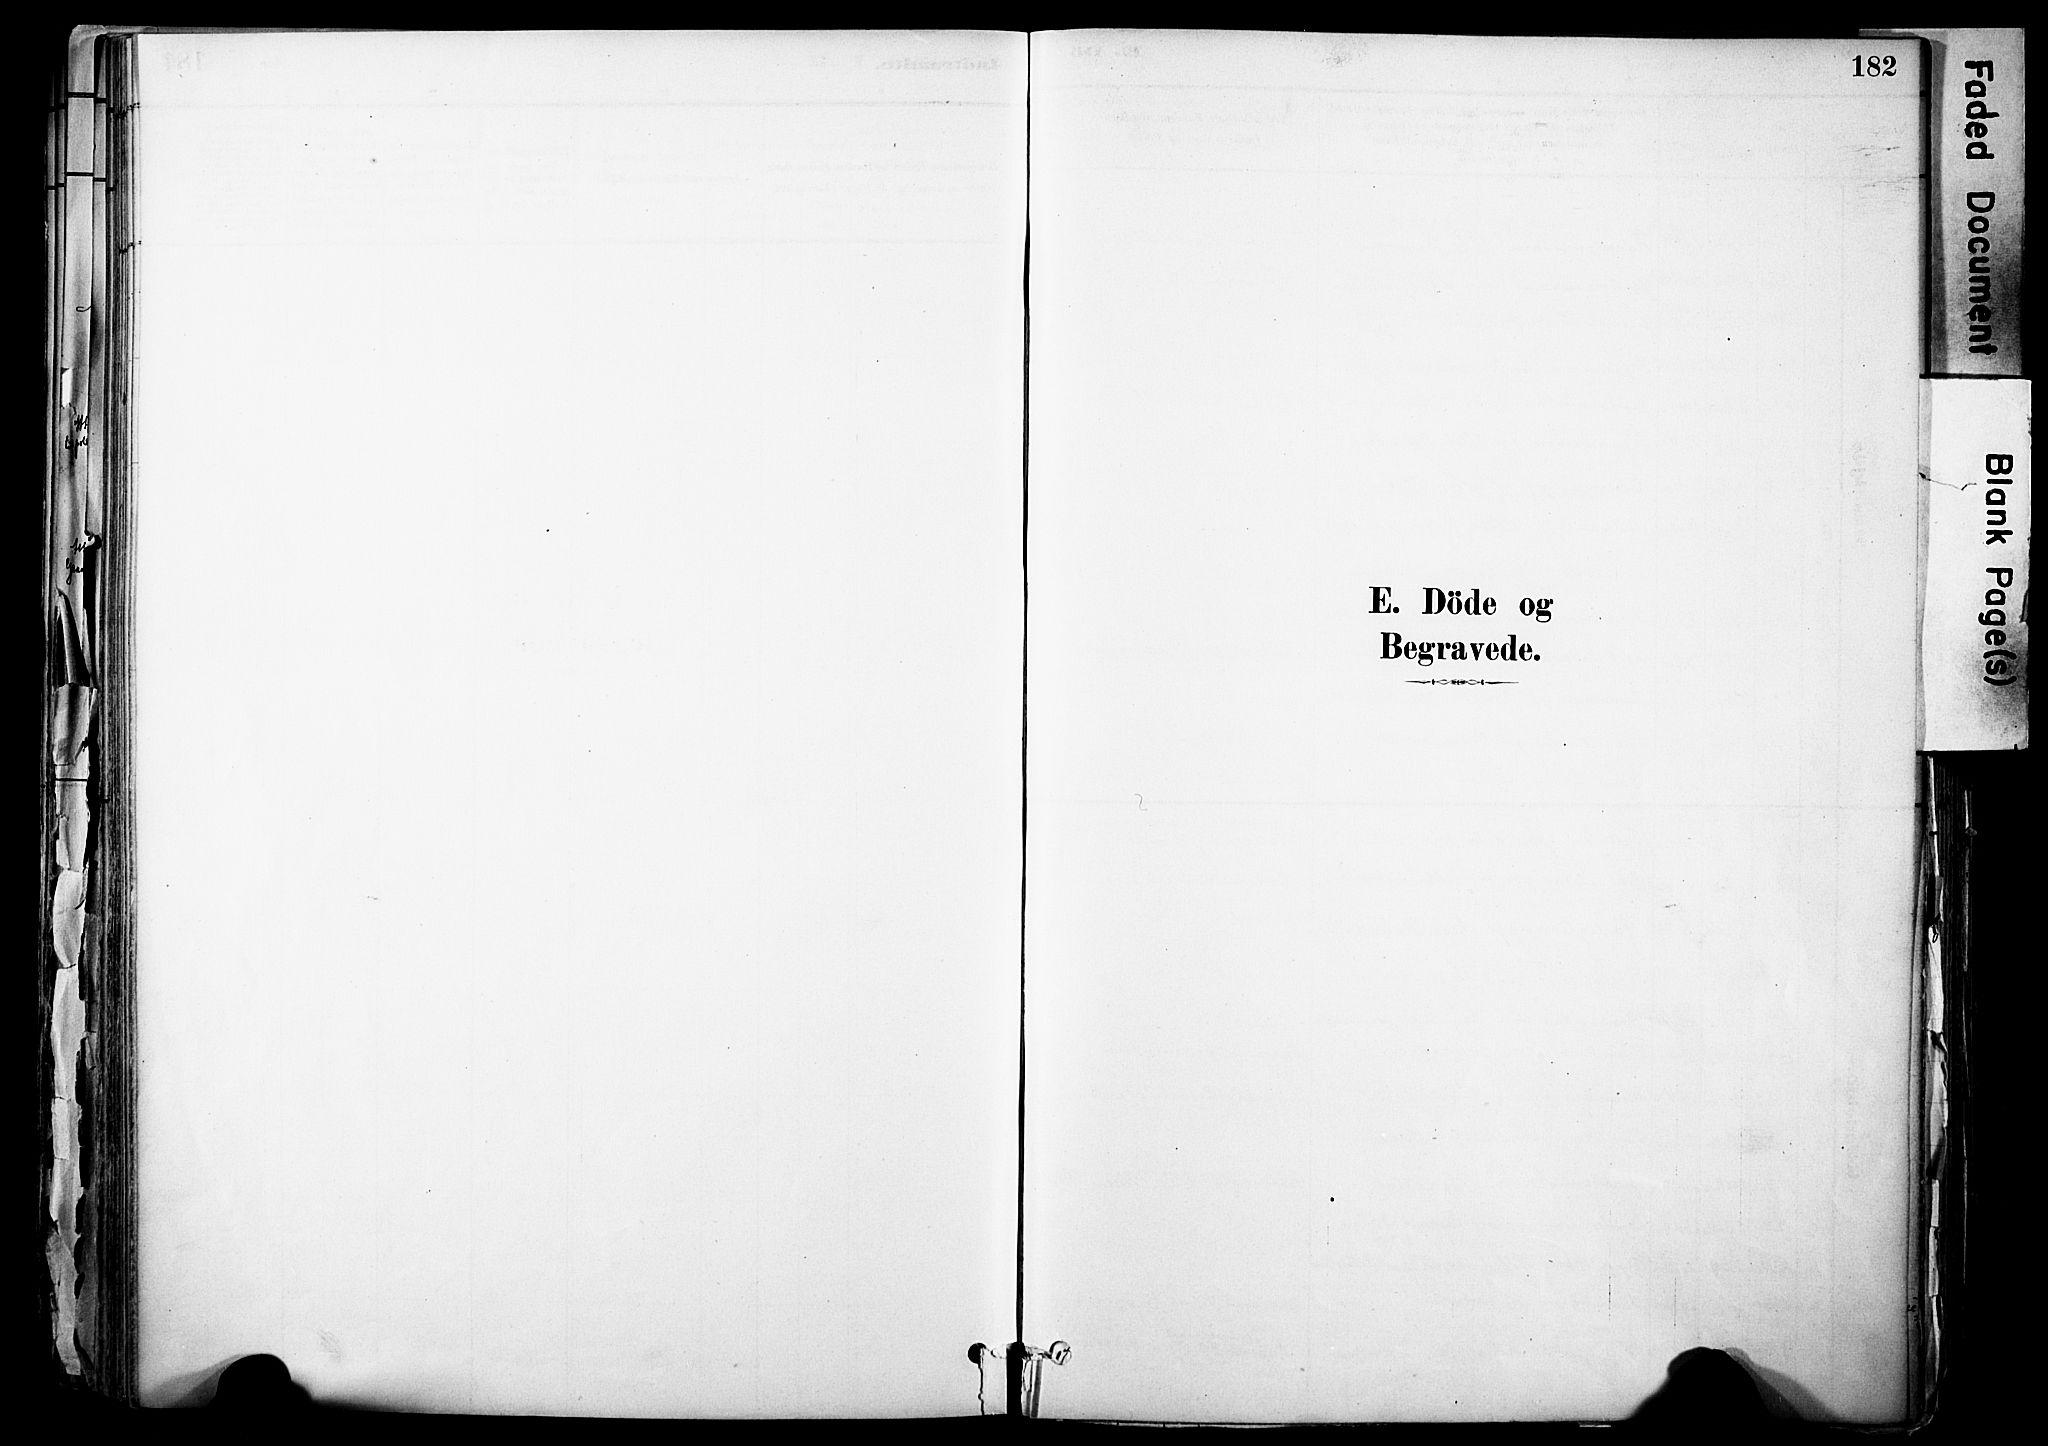 SAH, Skjåk prestekontor, Ministerialbok nr. 3, 1880-1907, s. 182